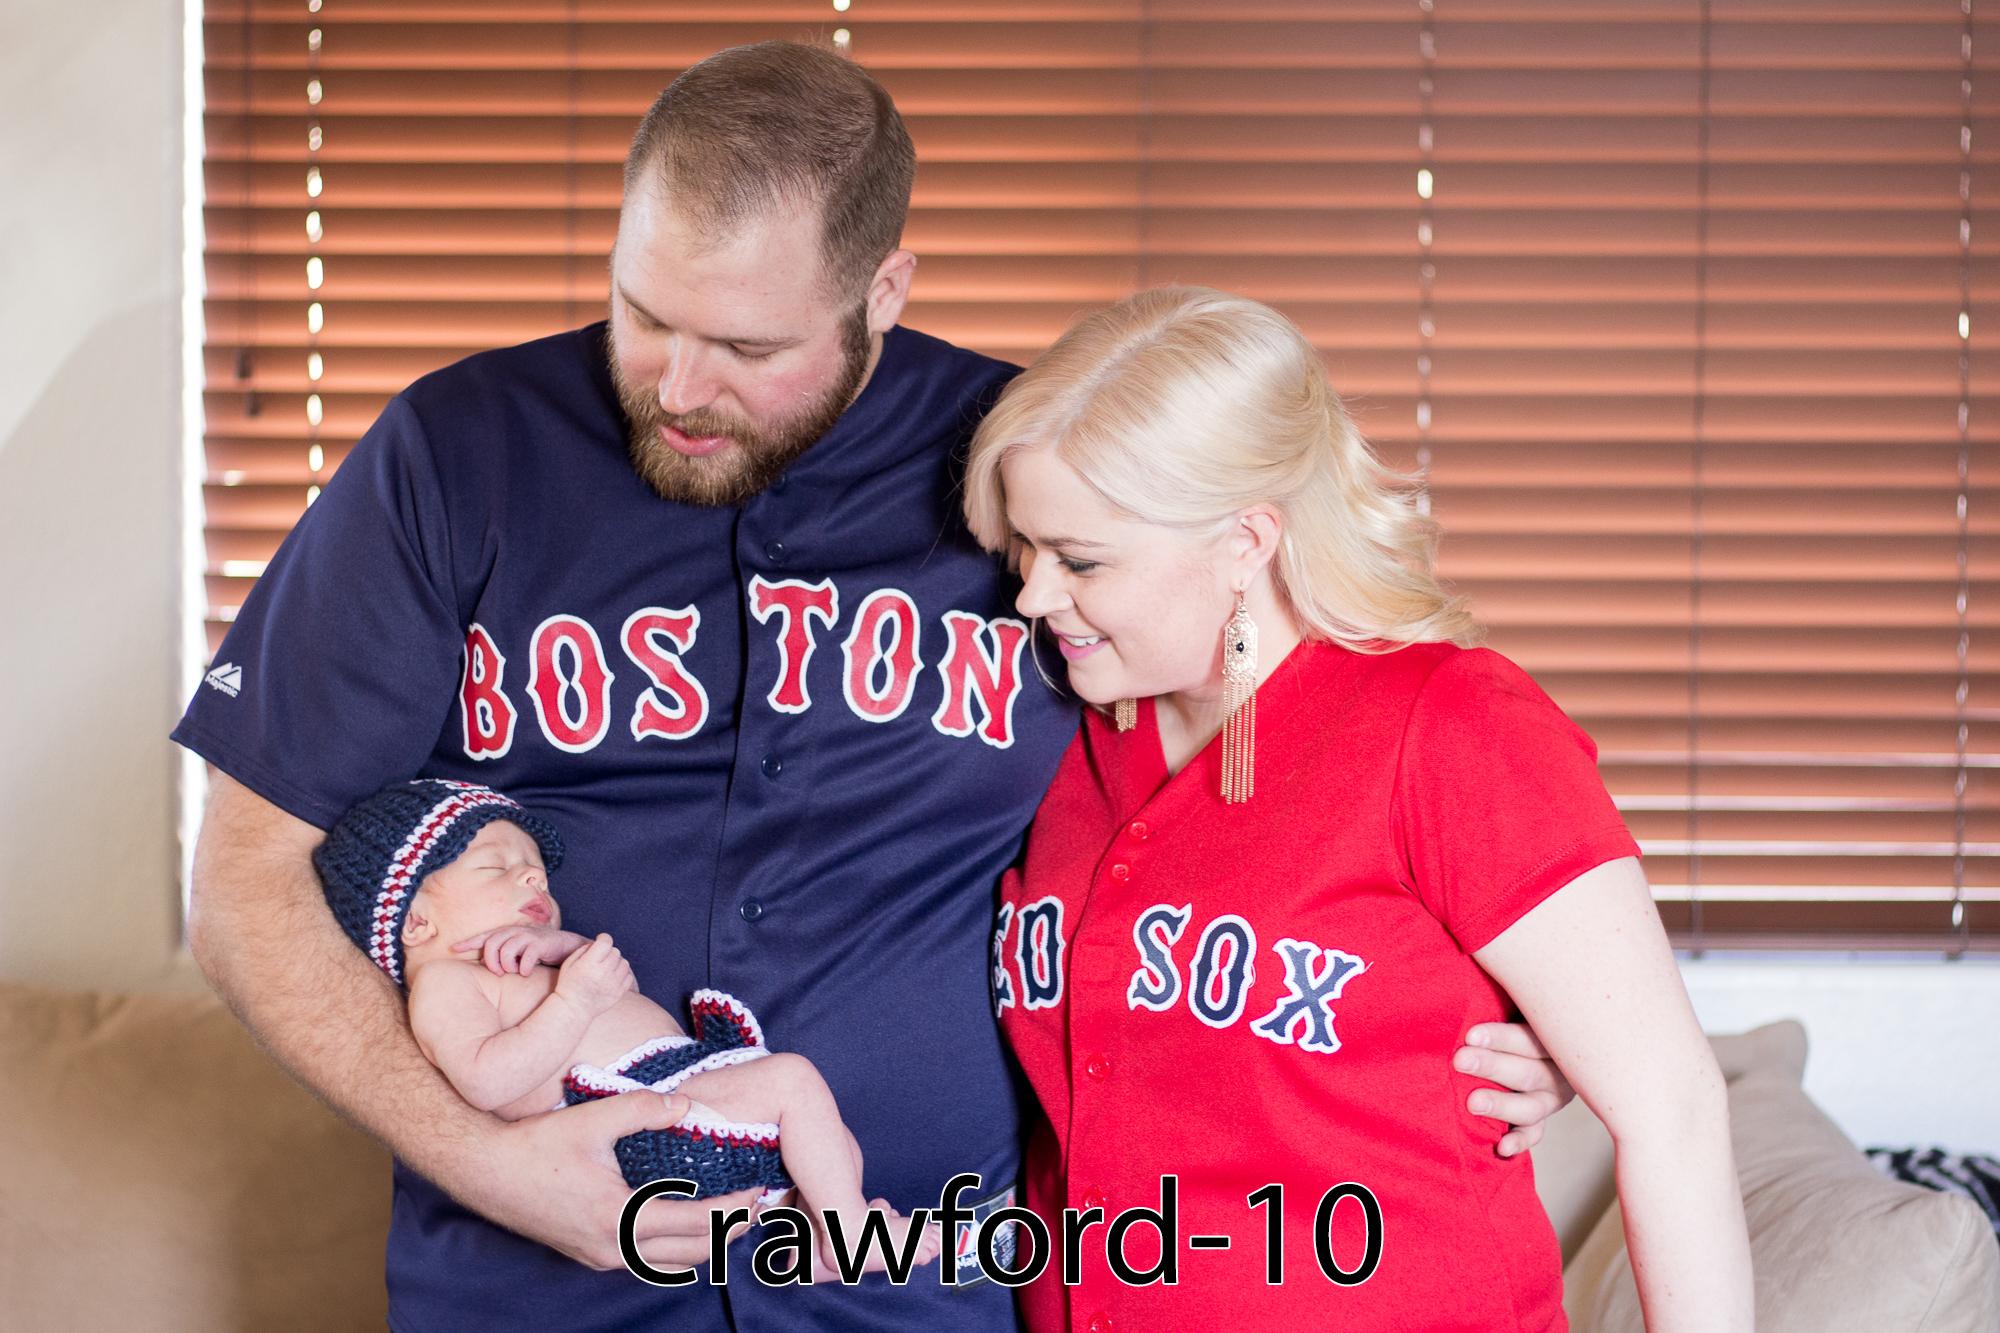 Crawford-10.jpg